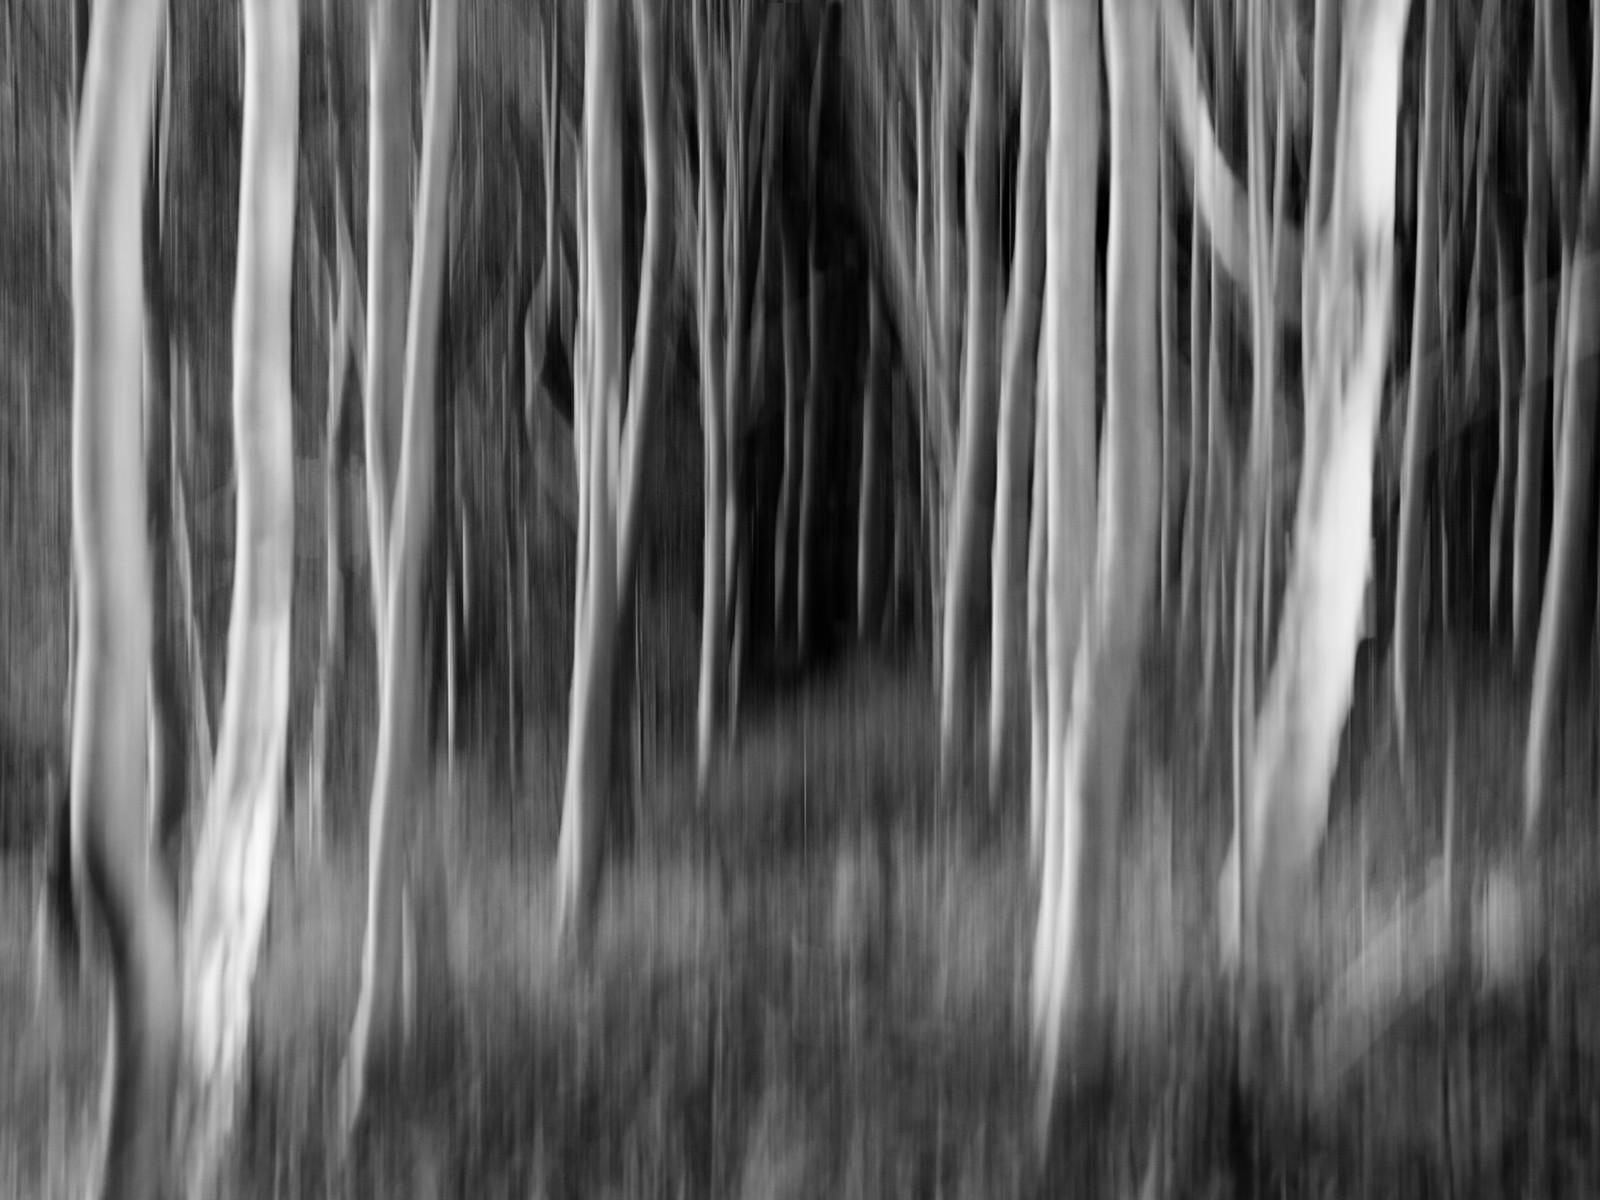 'Spooky Wood' by Brian McCaw (10 marks)